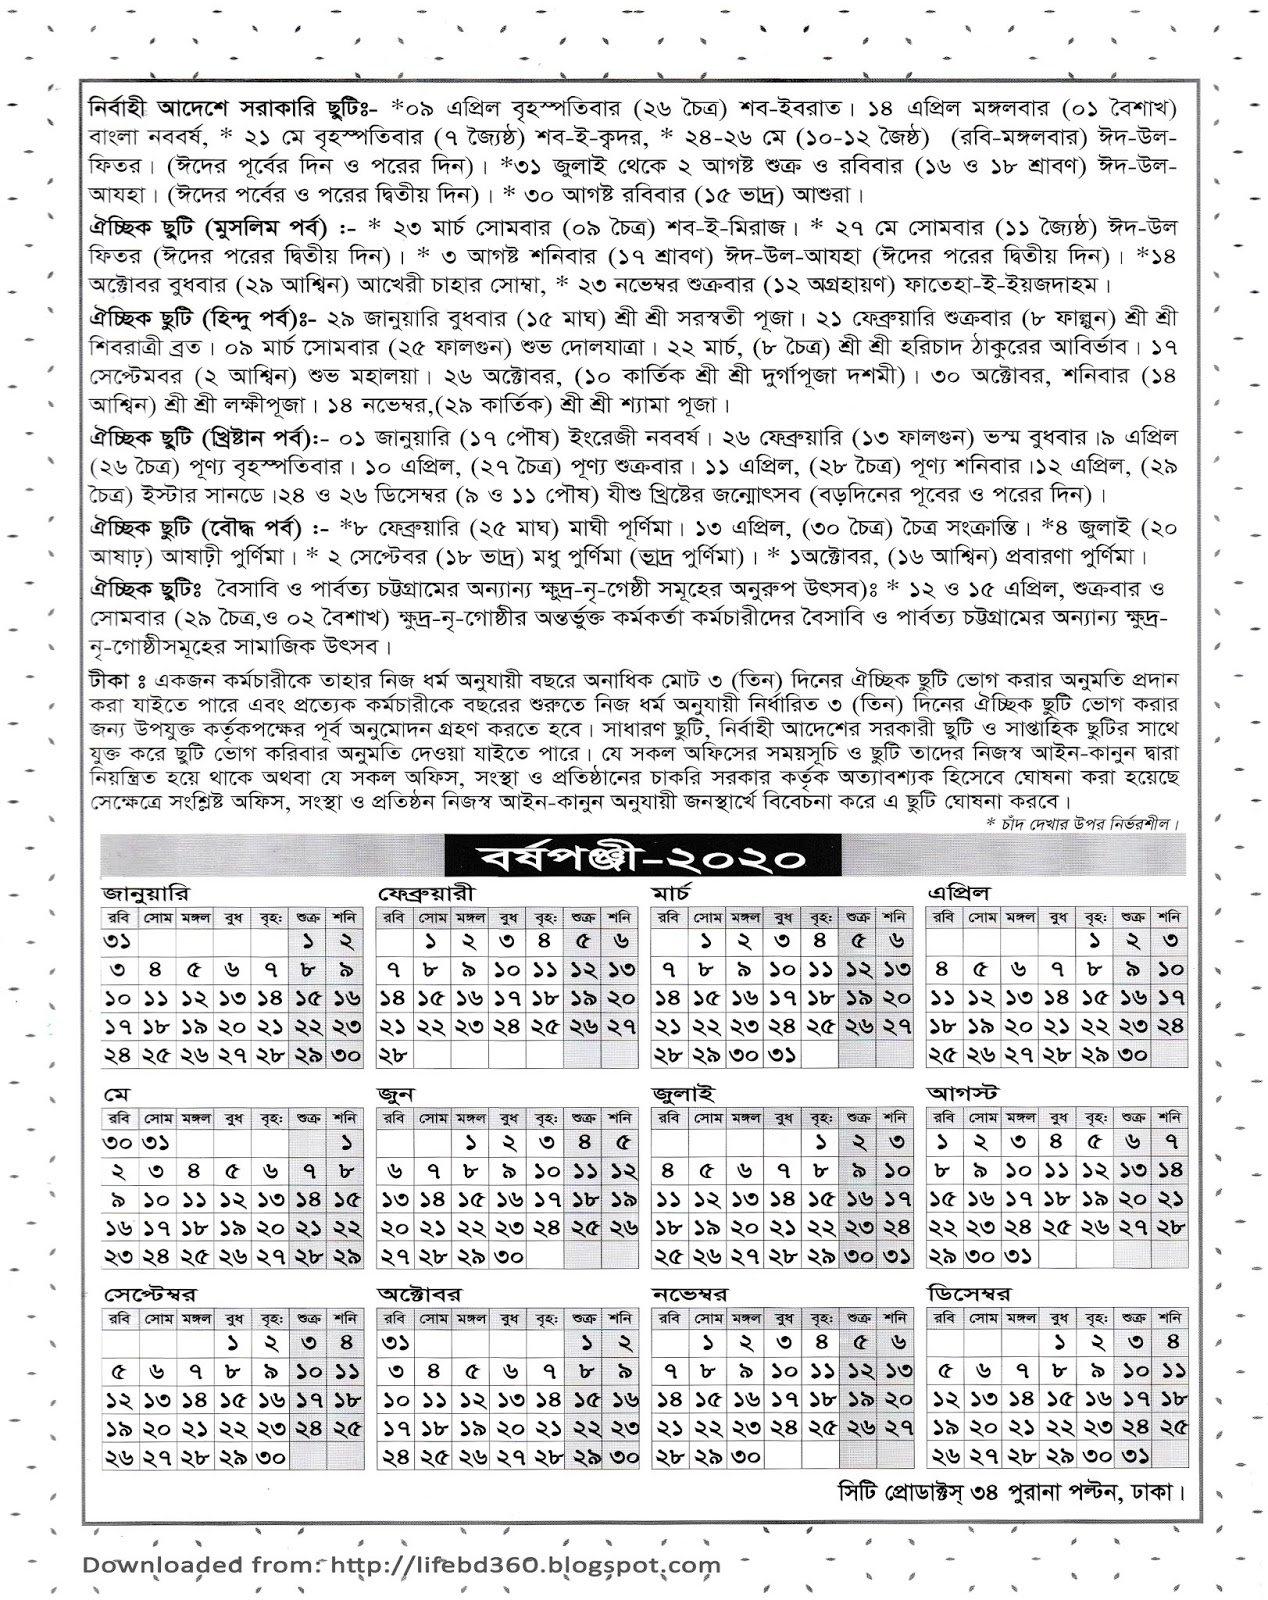 Bangladesh Government Holiday Calendar 2020 | Life In Bangladesh with Bangladesh Government Calendar 2021 Photo